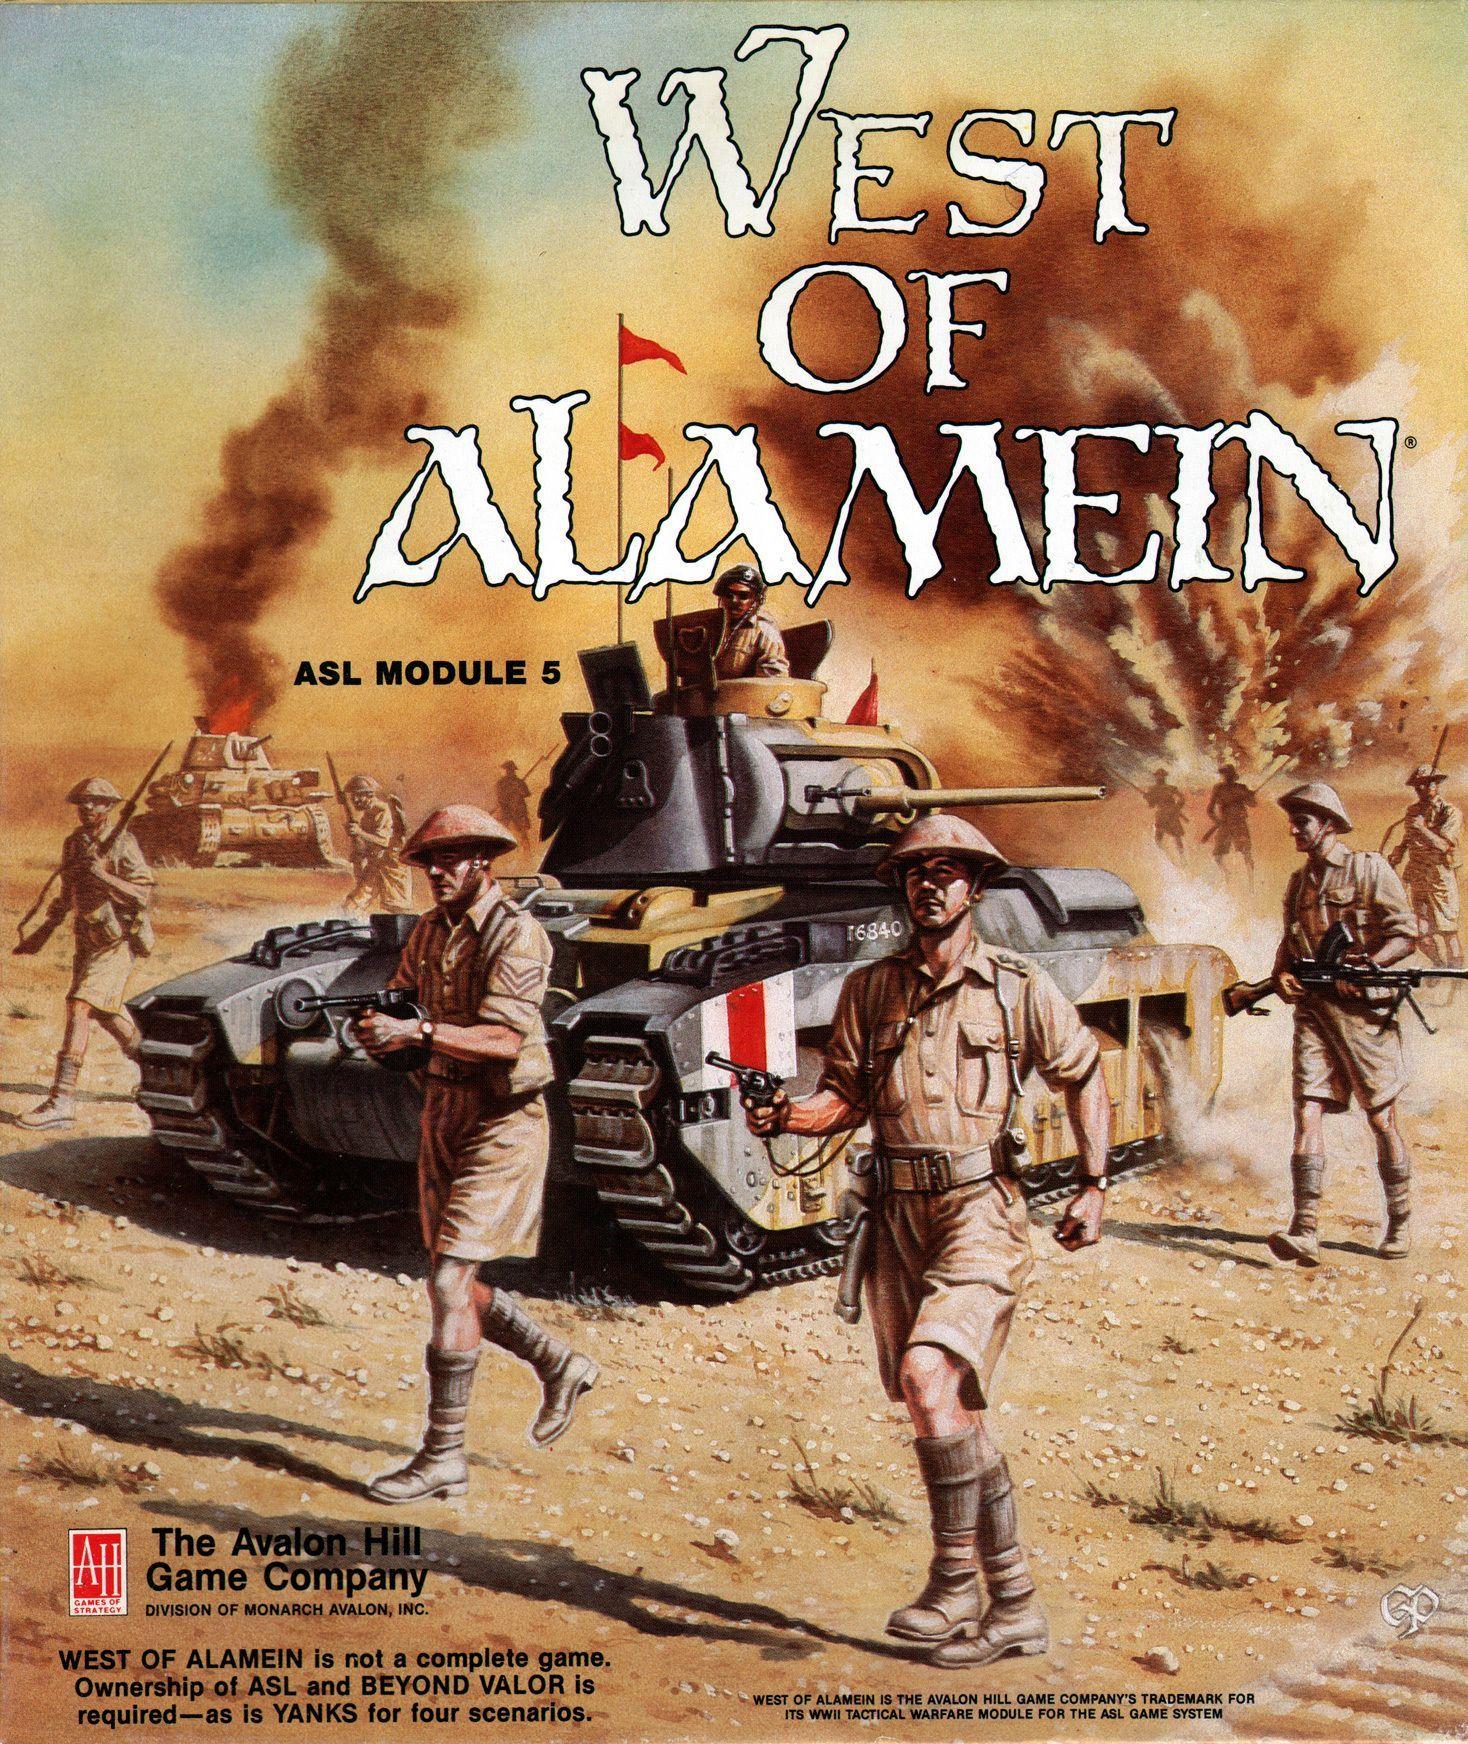 West of Alamein: ASL Module 5